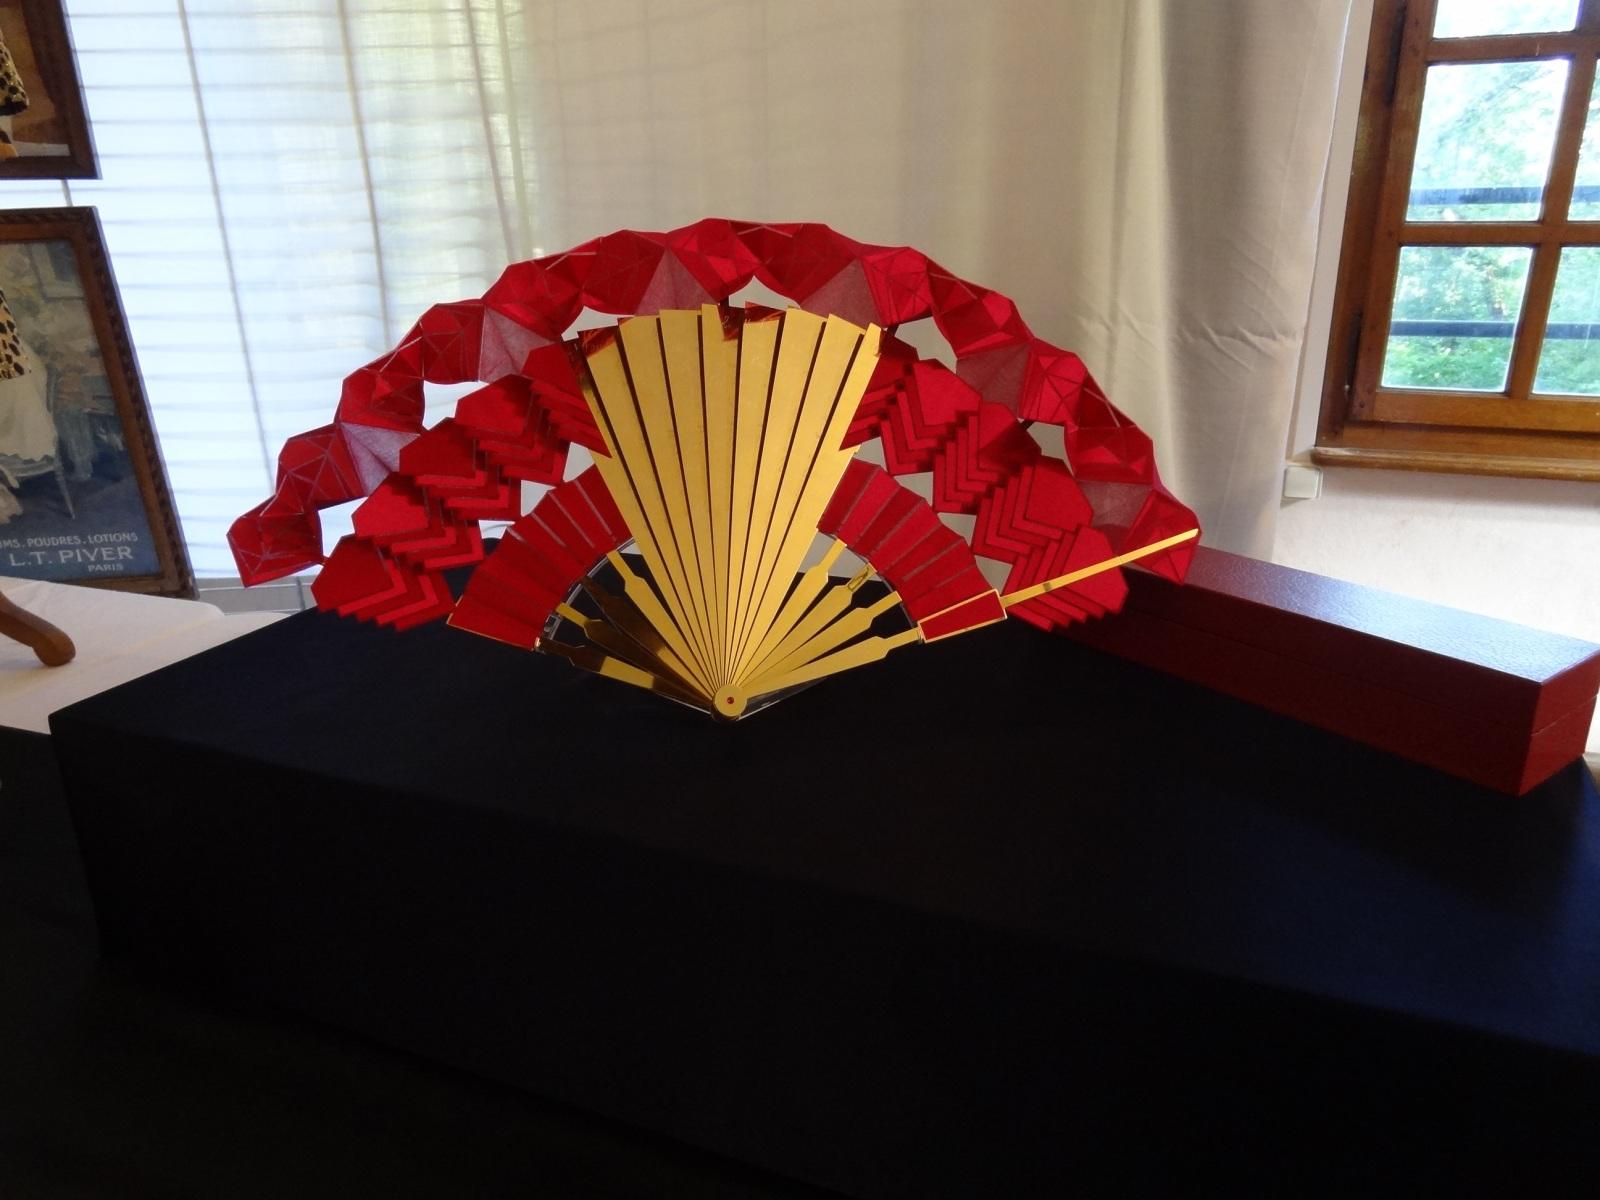 Ruby Fan at StEustache exhibition